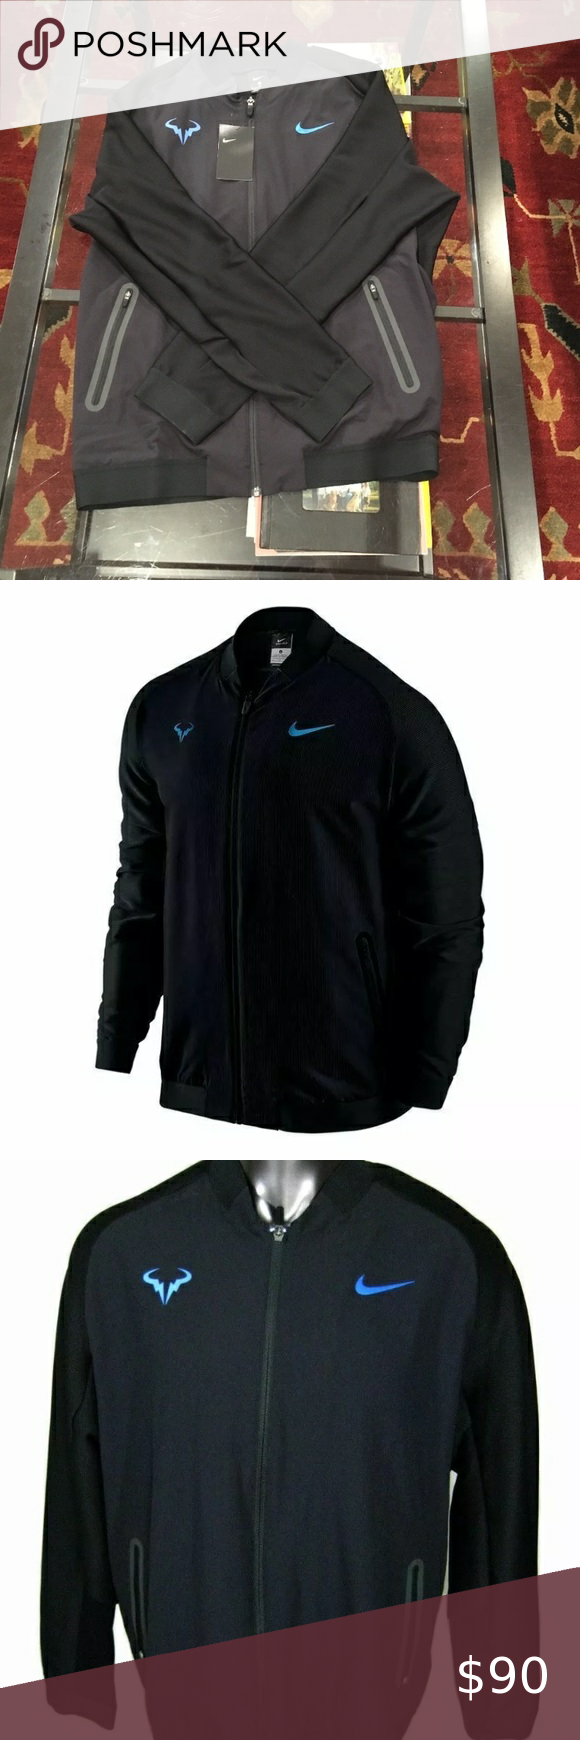 Nike Rafa Nadal Premier Tennis Jacket M 728986 010 In 2020 Jackets Nike Black Nikes